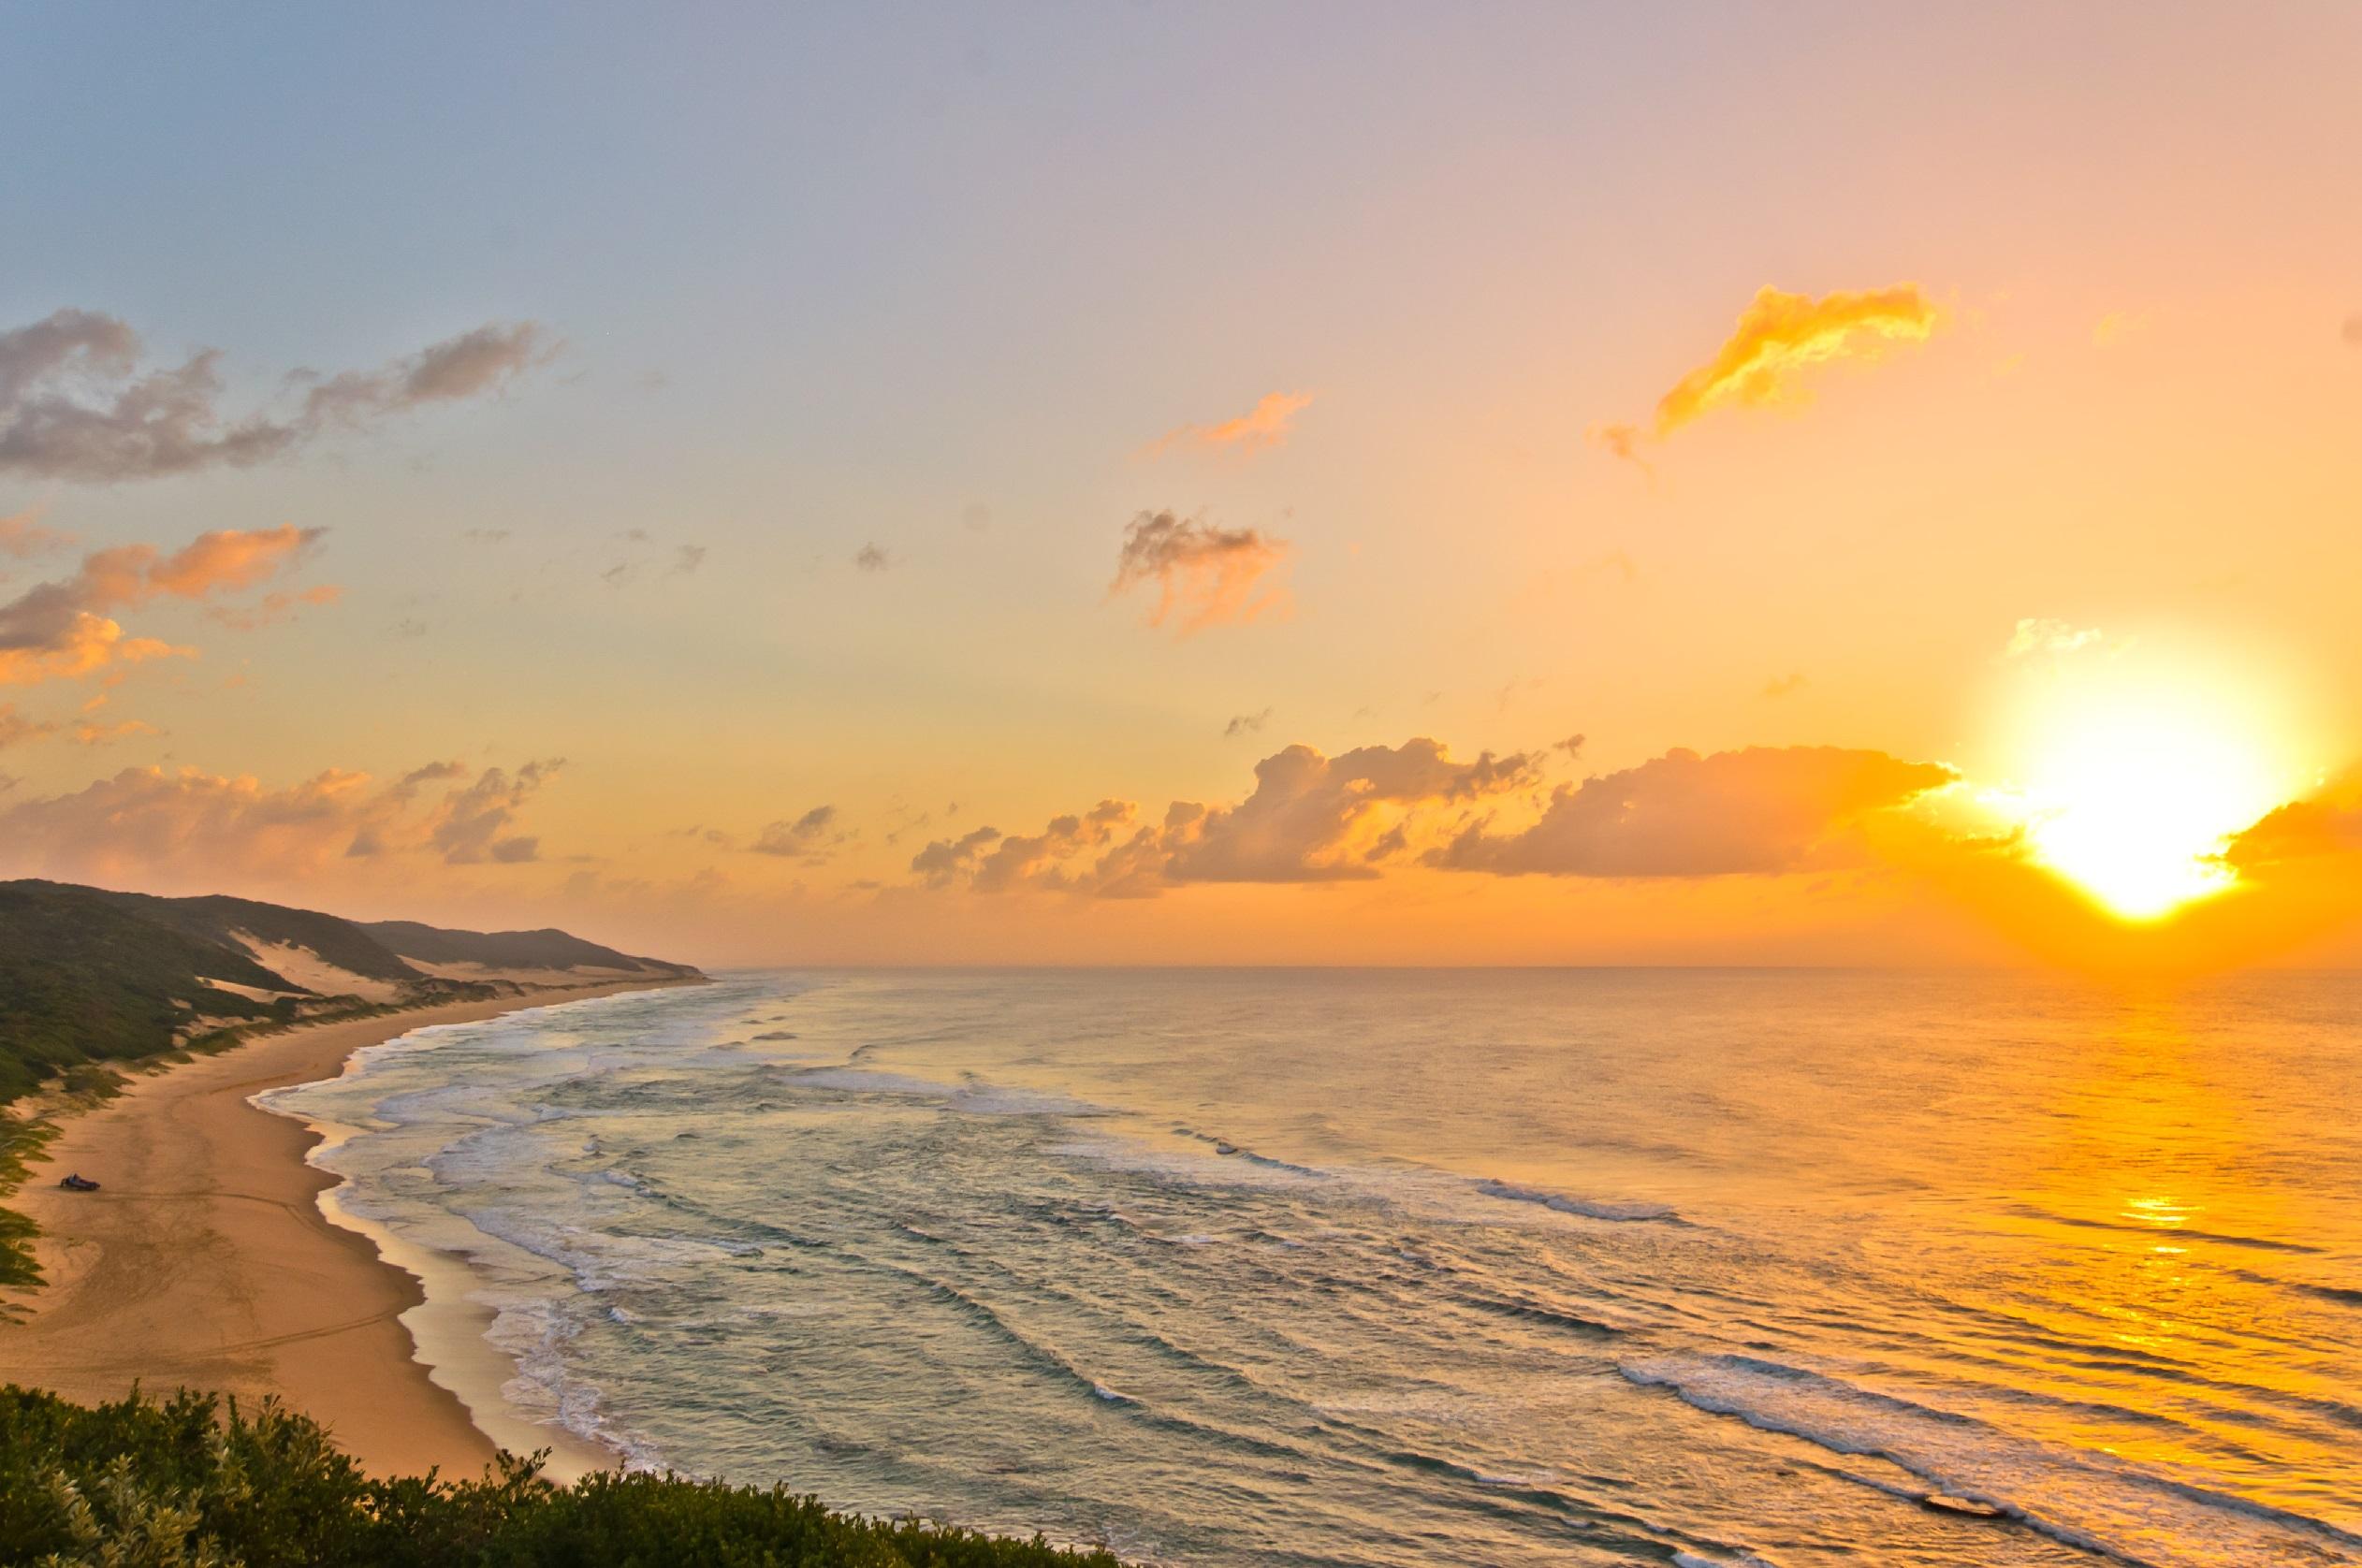 Thonga Beach sunrise - photograph by Carol Moller